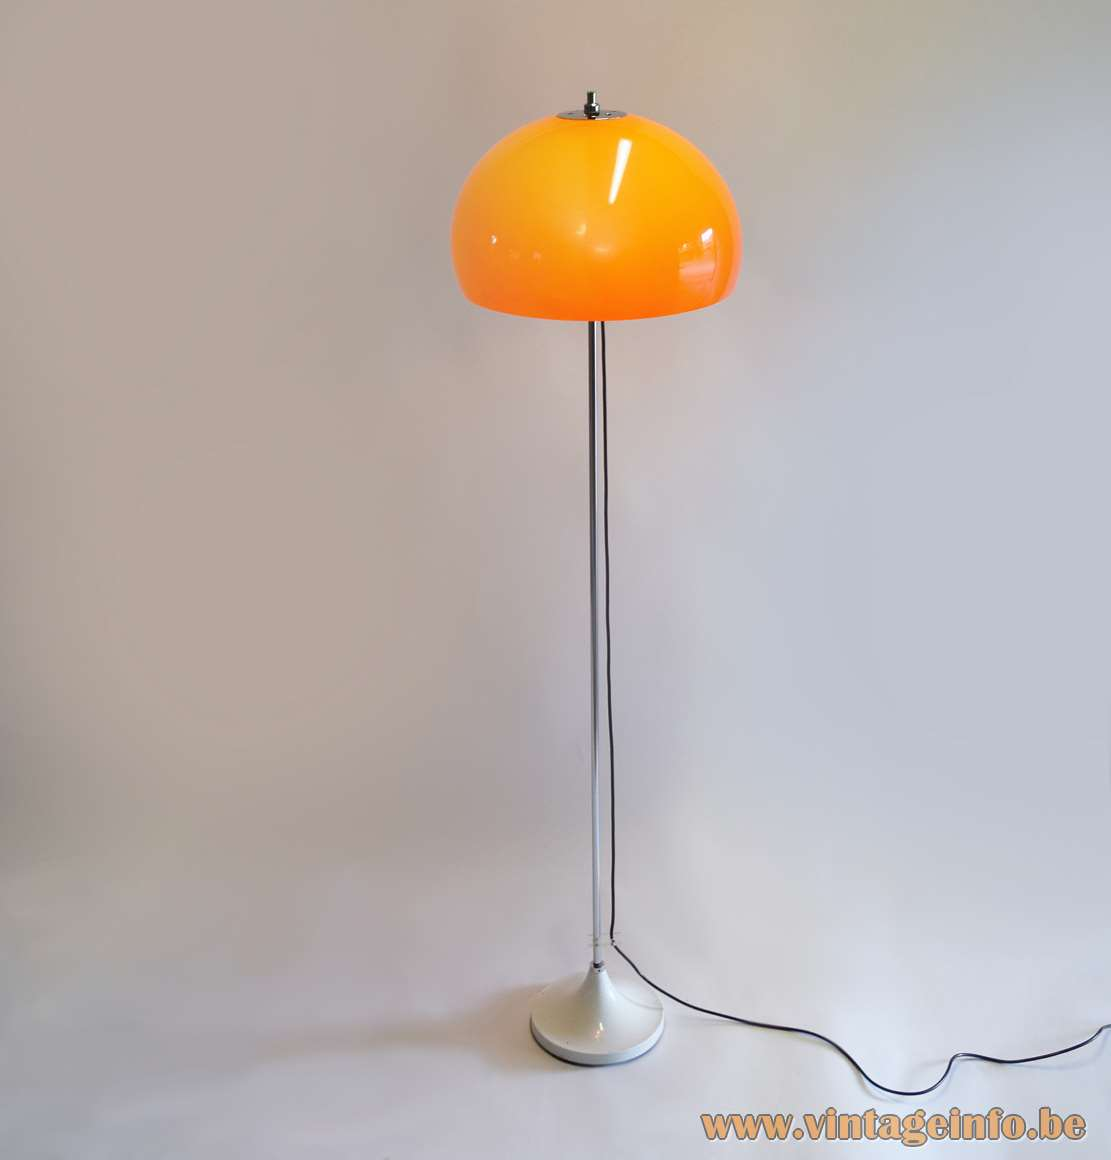 Hagoort mushroom floor lamp orange acrylic Perspex lampshade chrome rod round white base 1960s 1970s